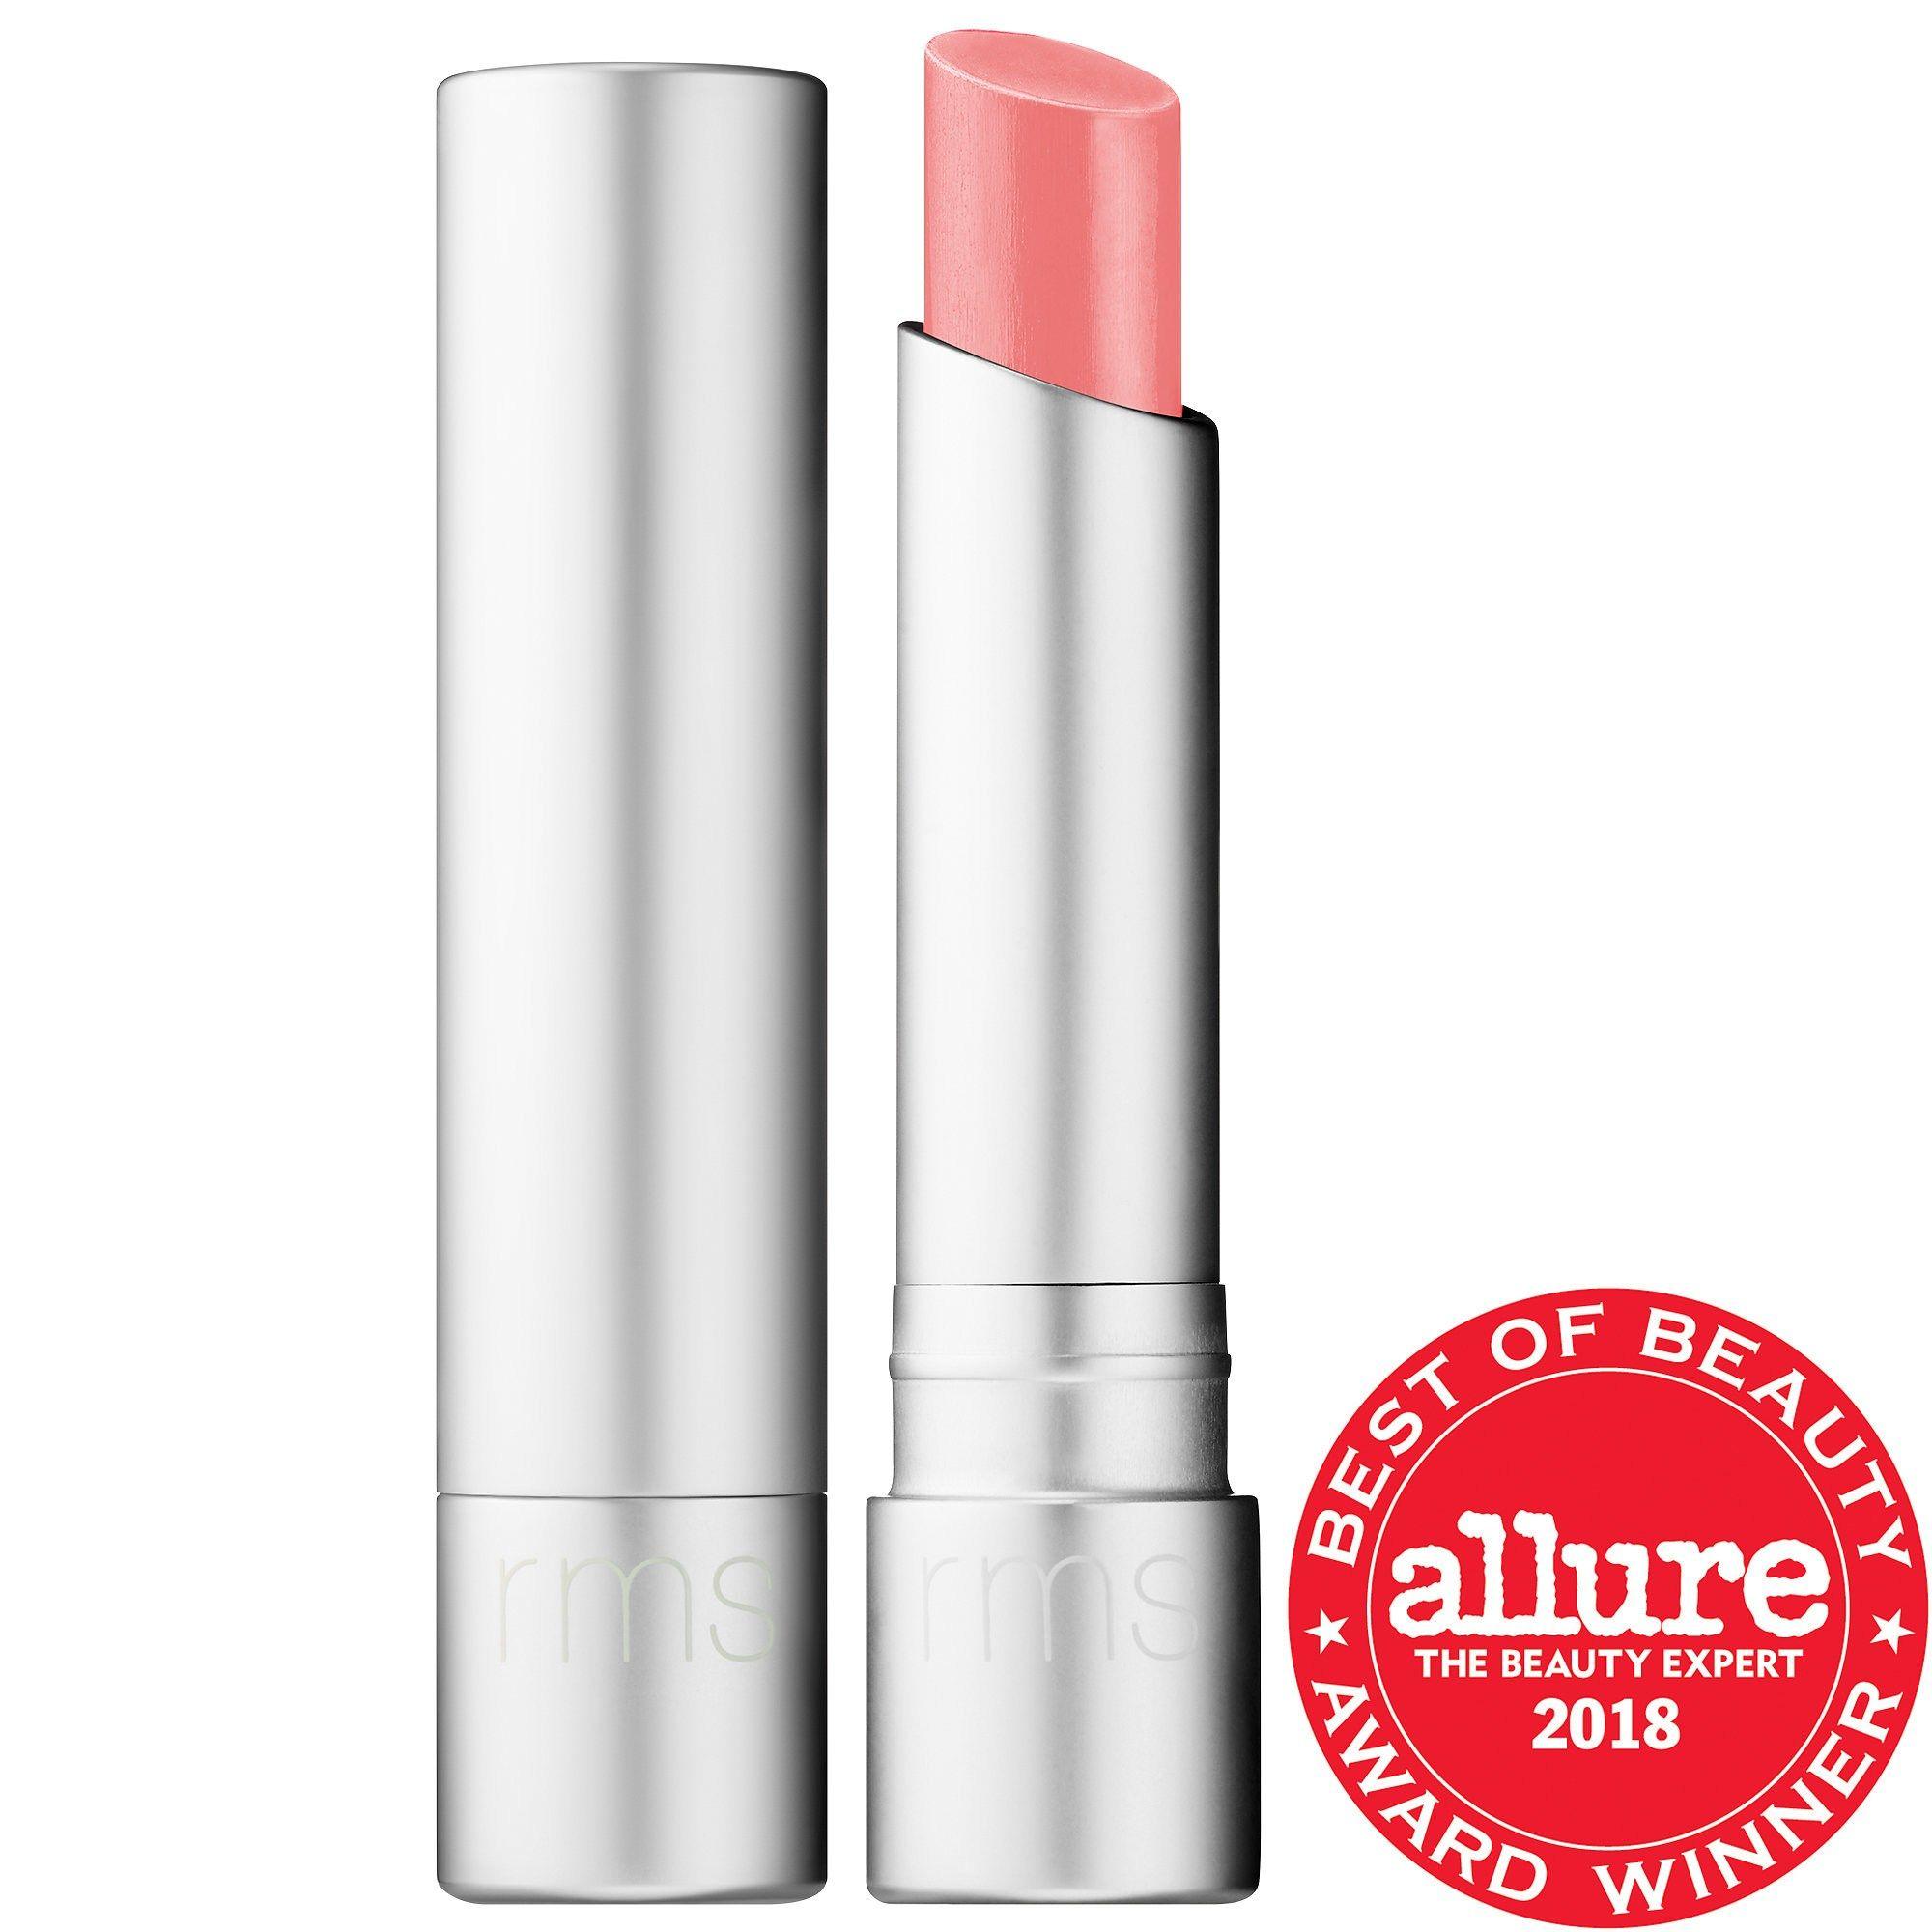 Wild With Desire Lipstick Rms beauty, Beauty oil, Sephora